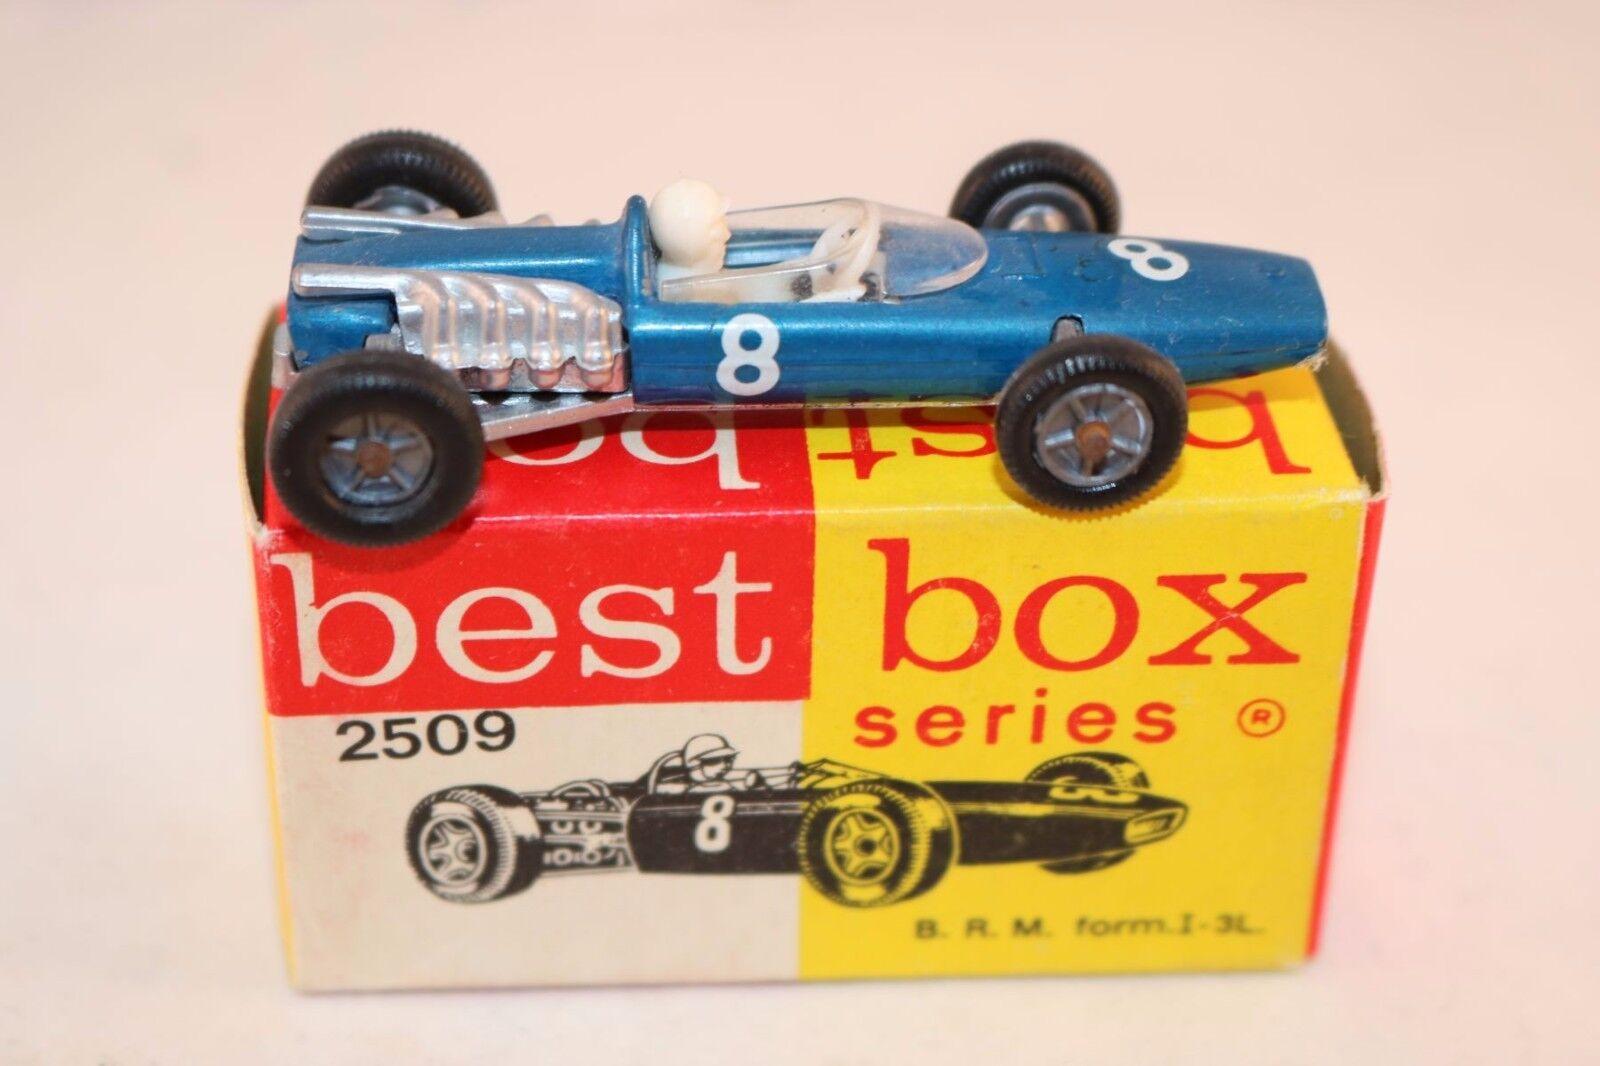 Bestbox Best Box 2509 B.R.M. Form 1-3L rare bluee bluee bluee 99.9% mint in mint box superb 51d09e